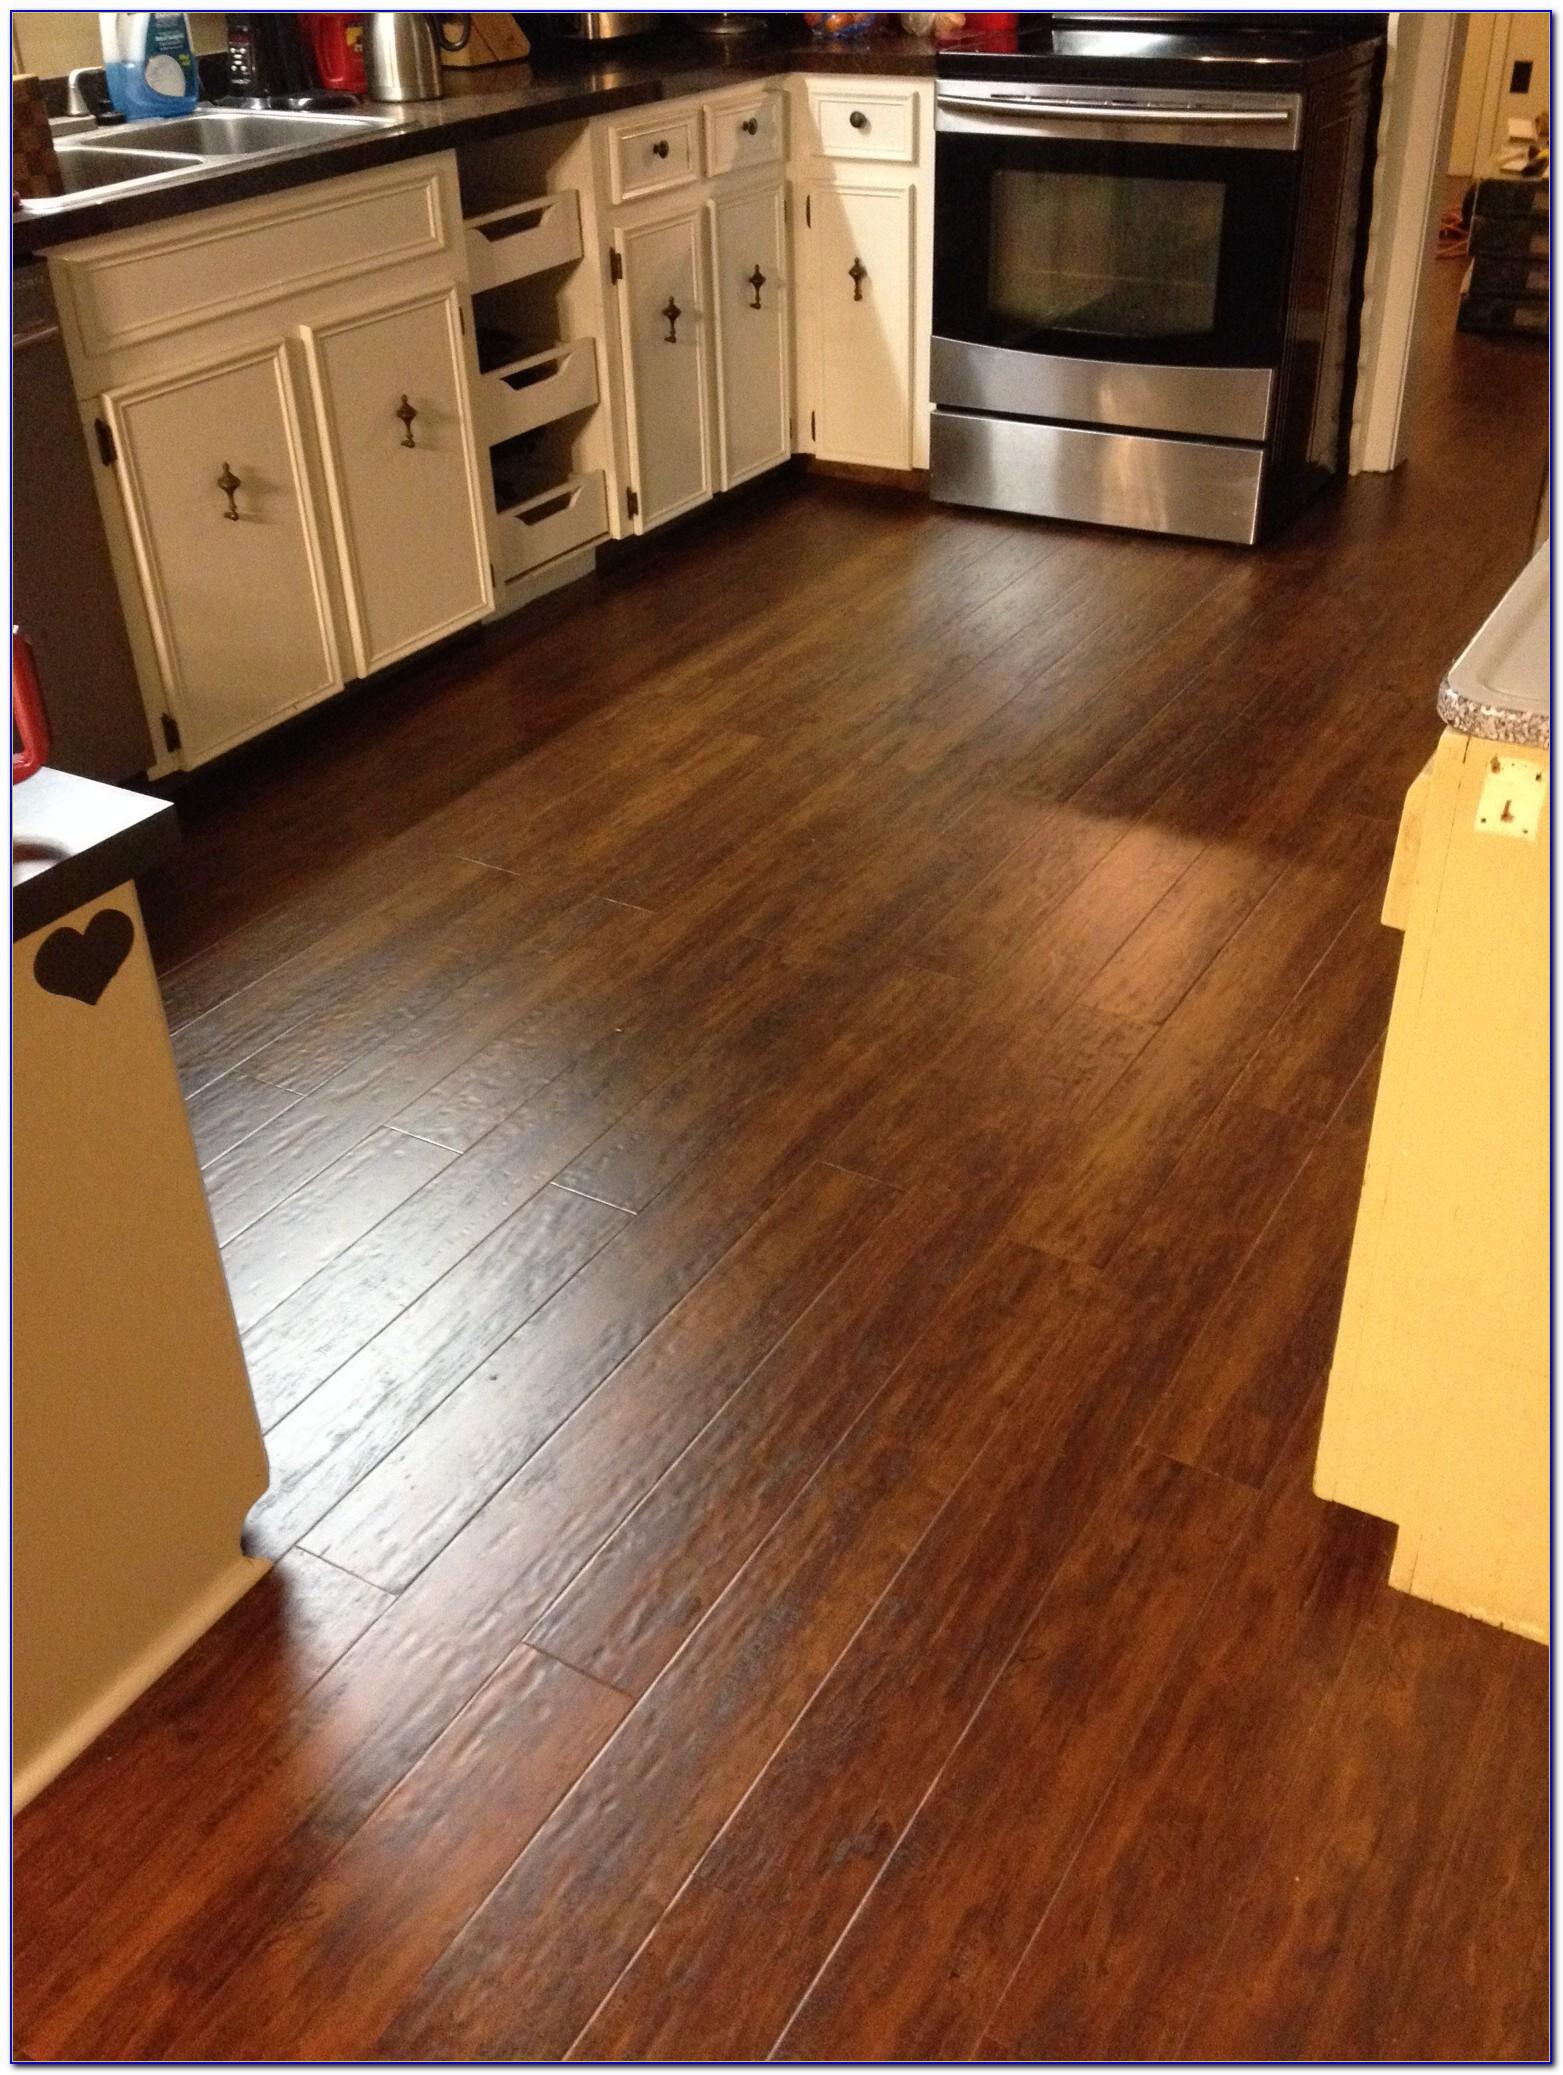 Kensington Manor Laminate Wood Flooring